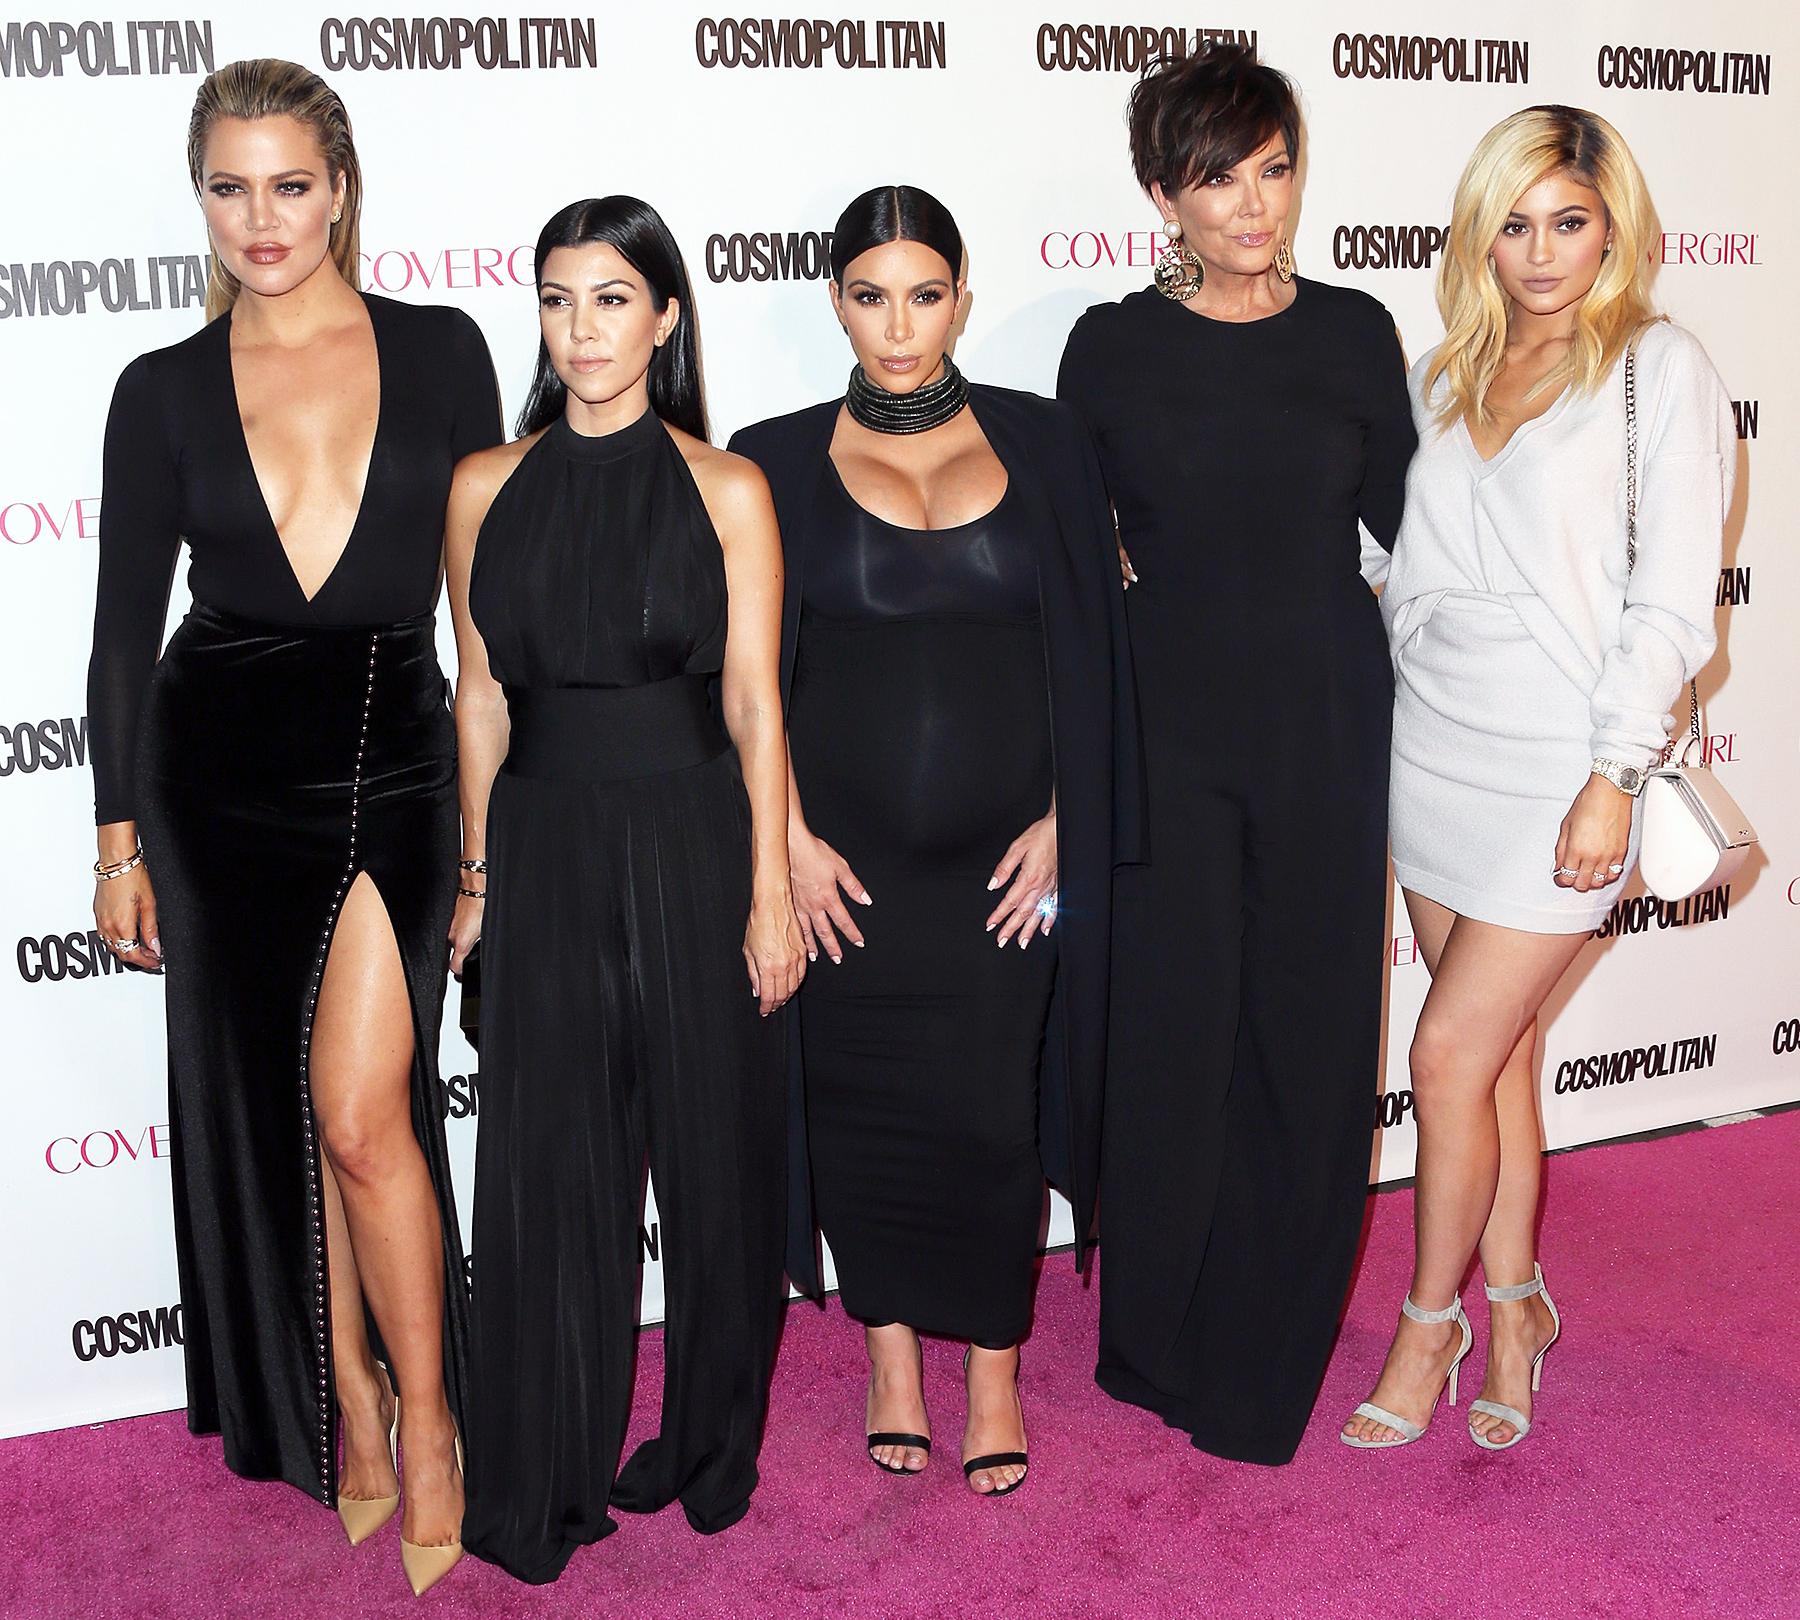 Kourtney Kardashian Khloe Kardashian Kim Kardashian Kris Jenner Kylie Jenner